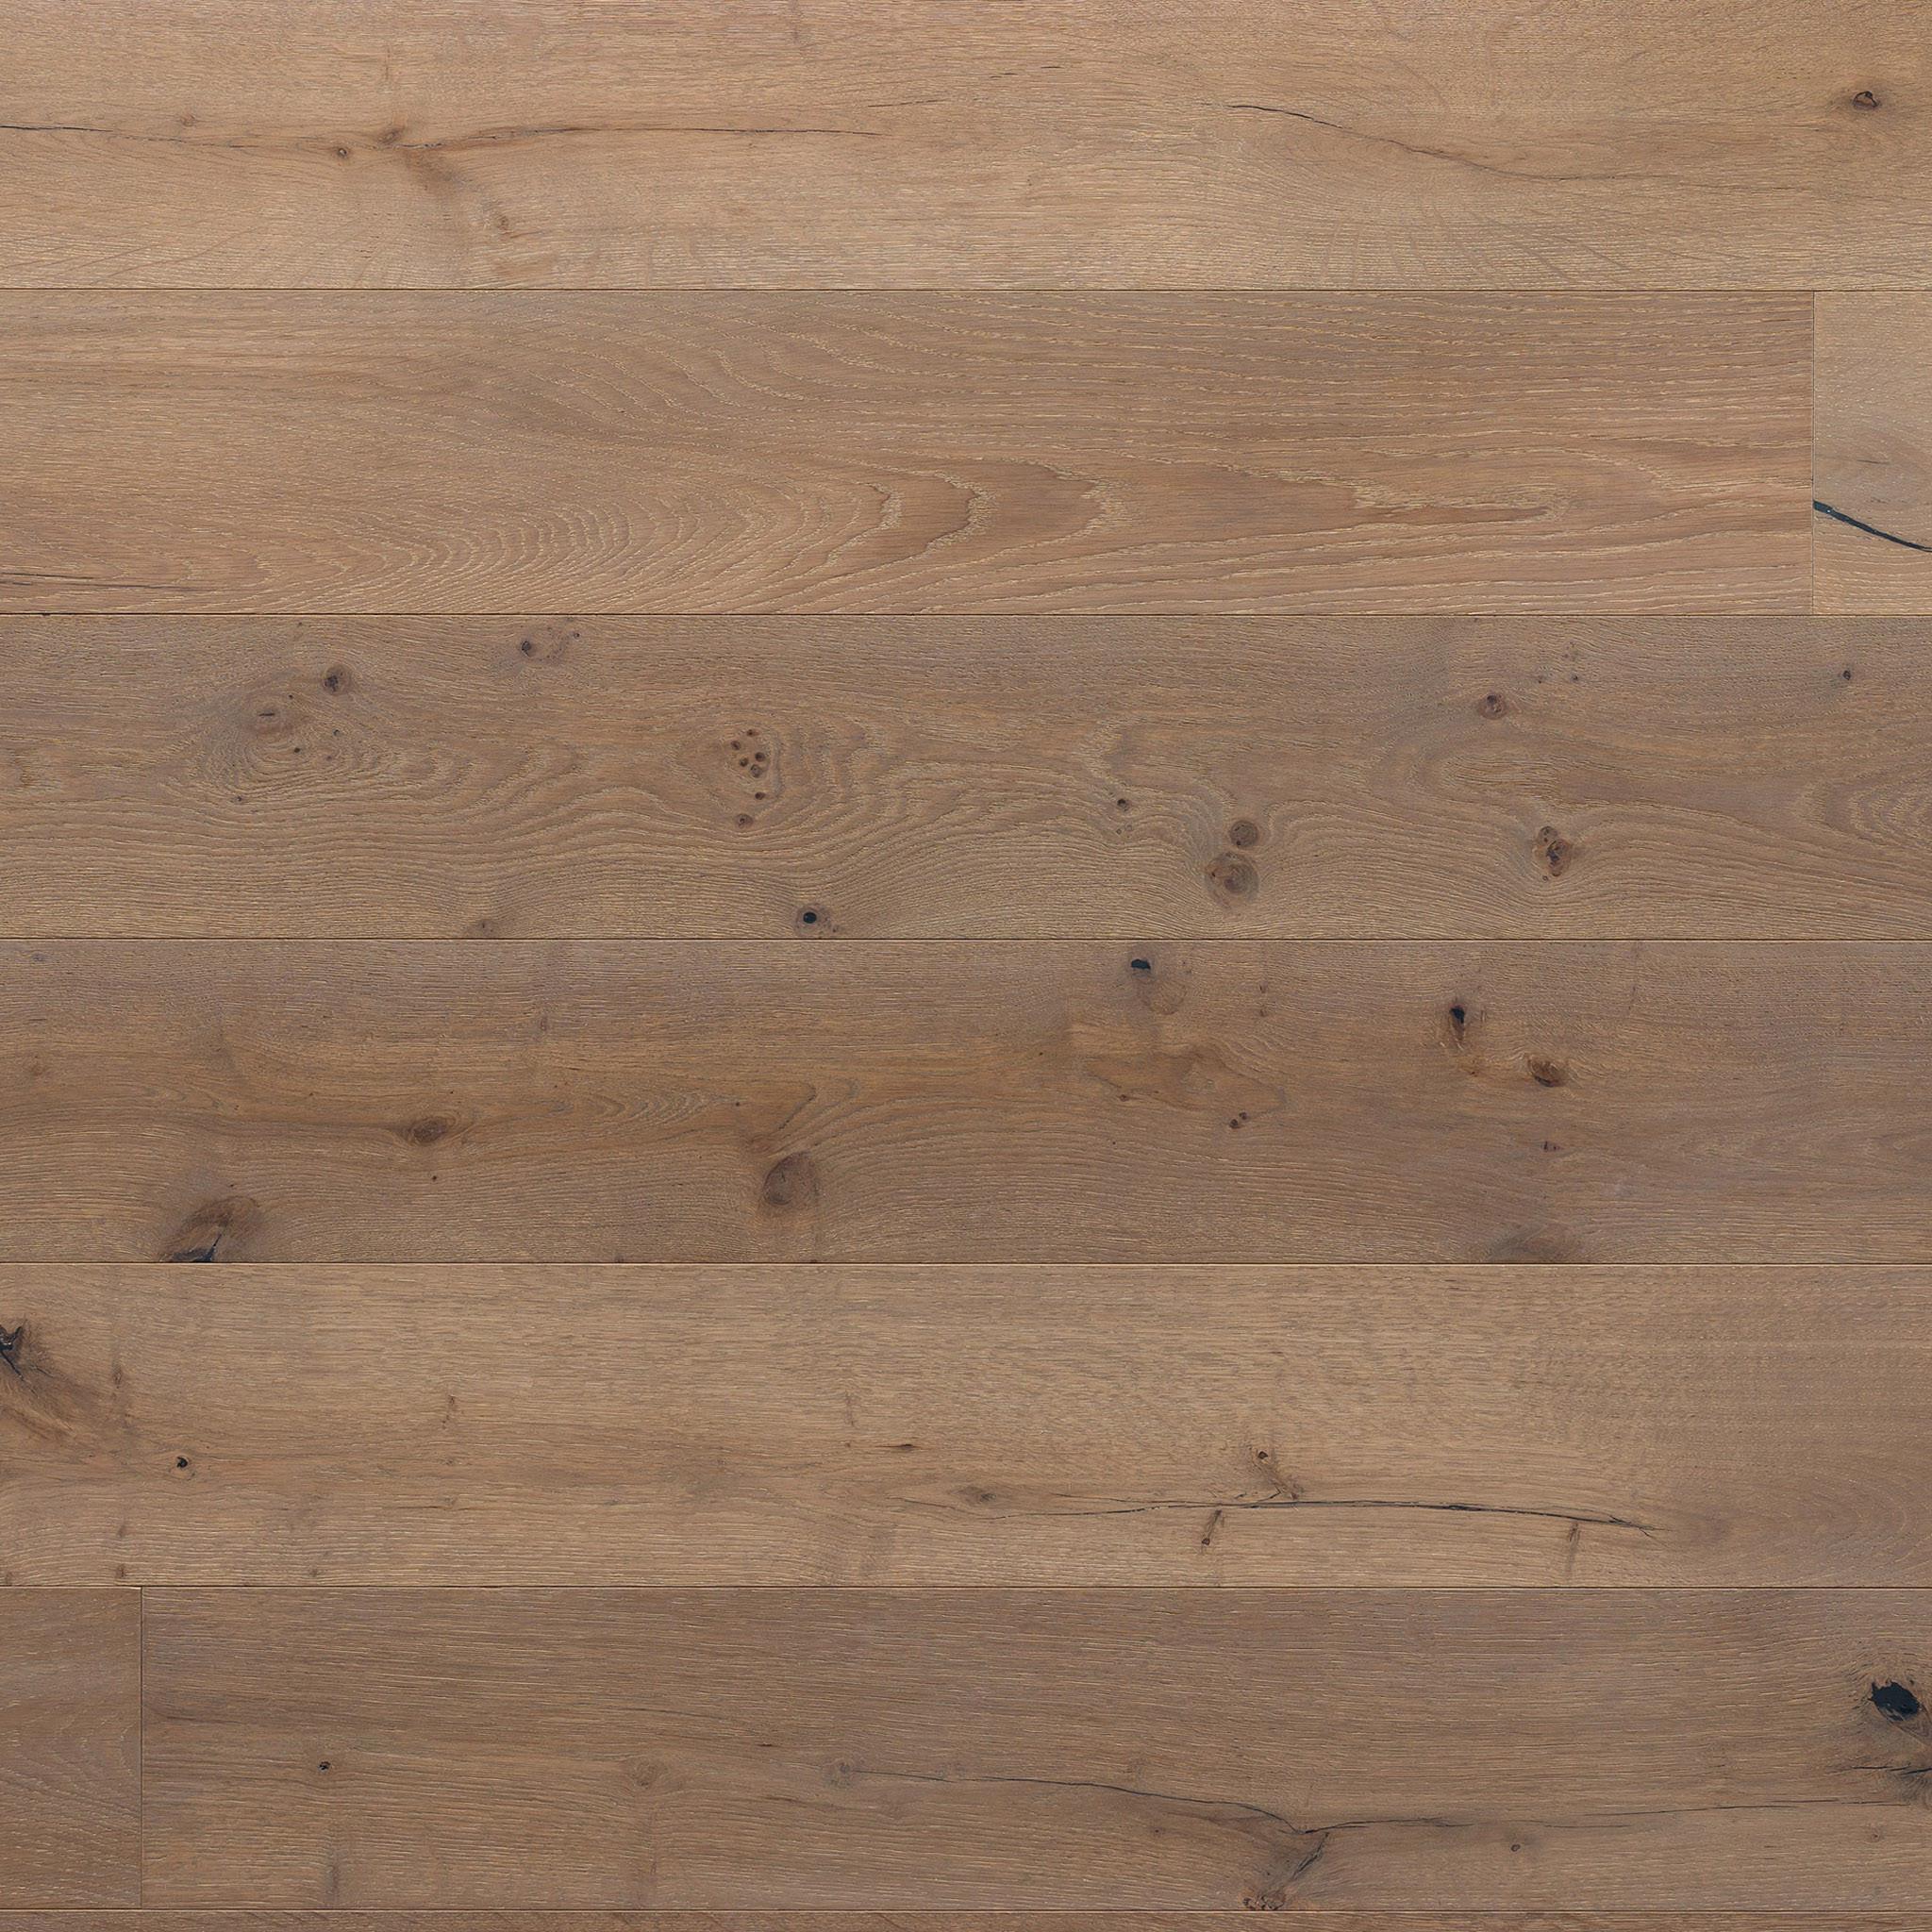 buy hardwood flooring online canada of brushed oak burrow kentwood floors regarding brushed oak burrow